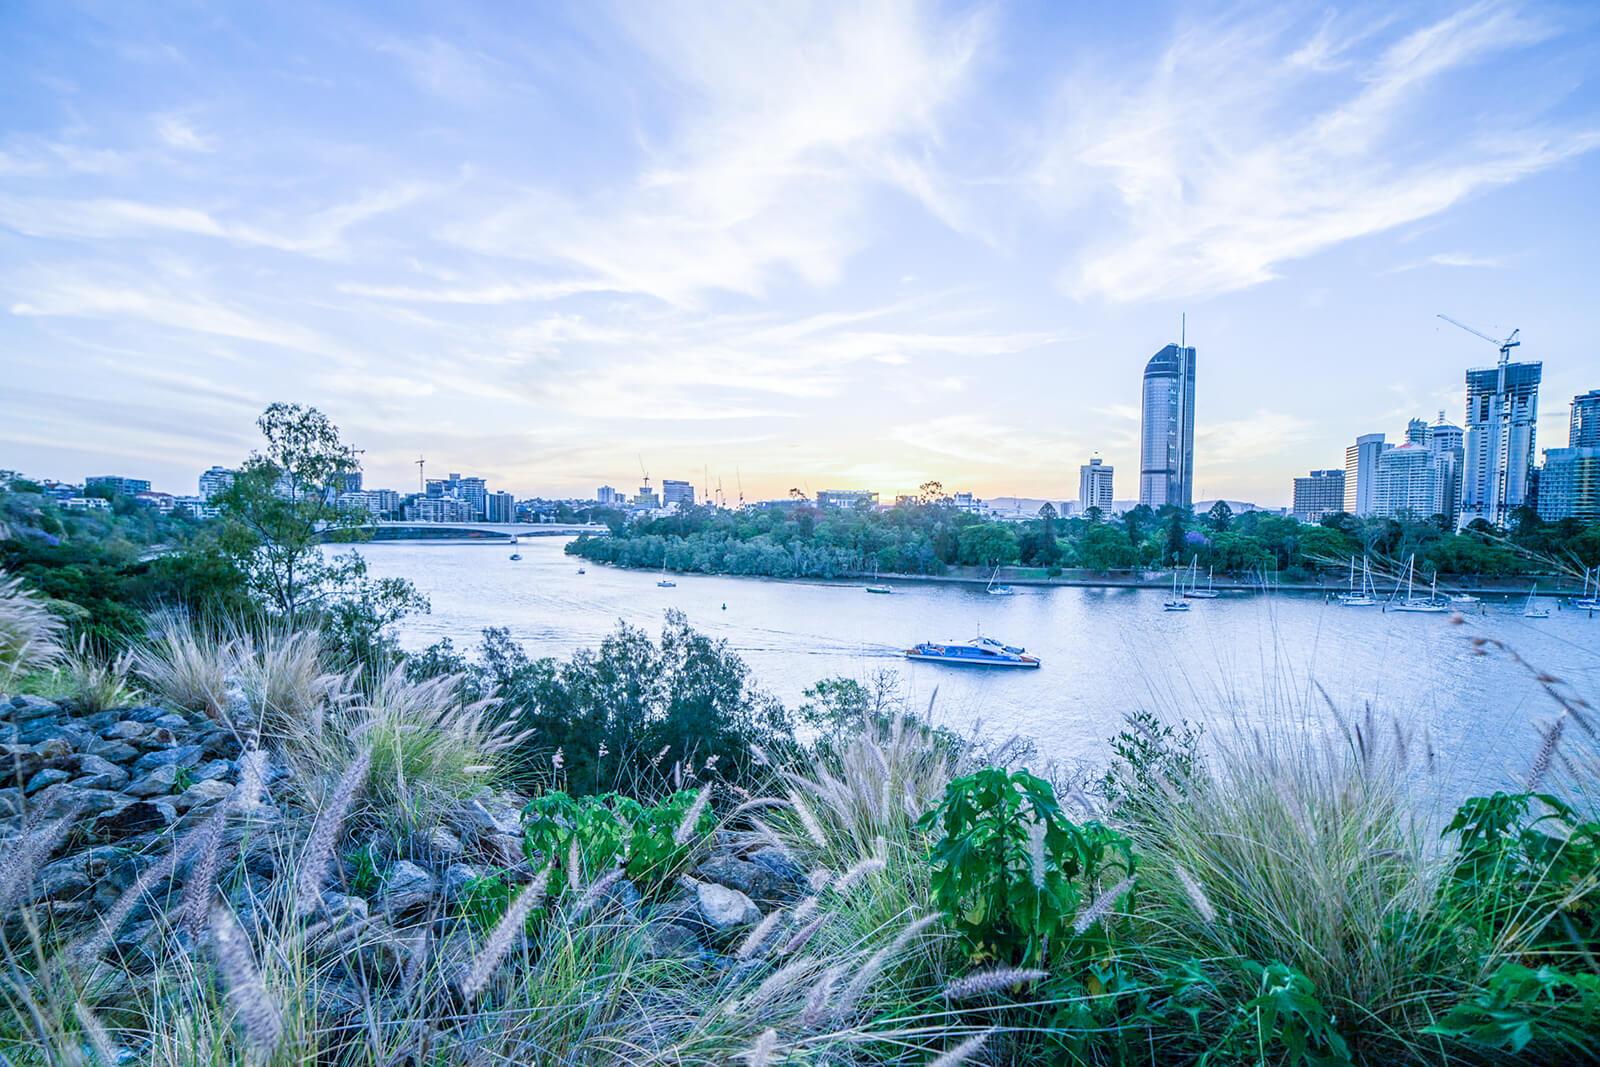 Brisbane River from Kangaroo Point Cliffs